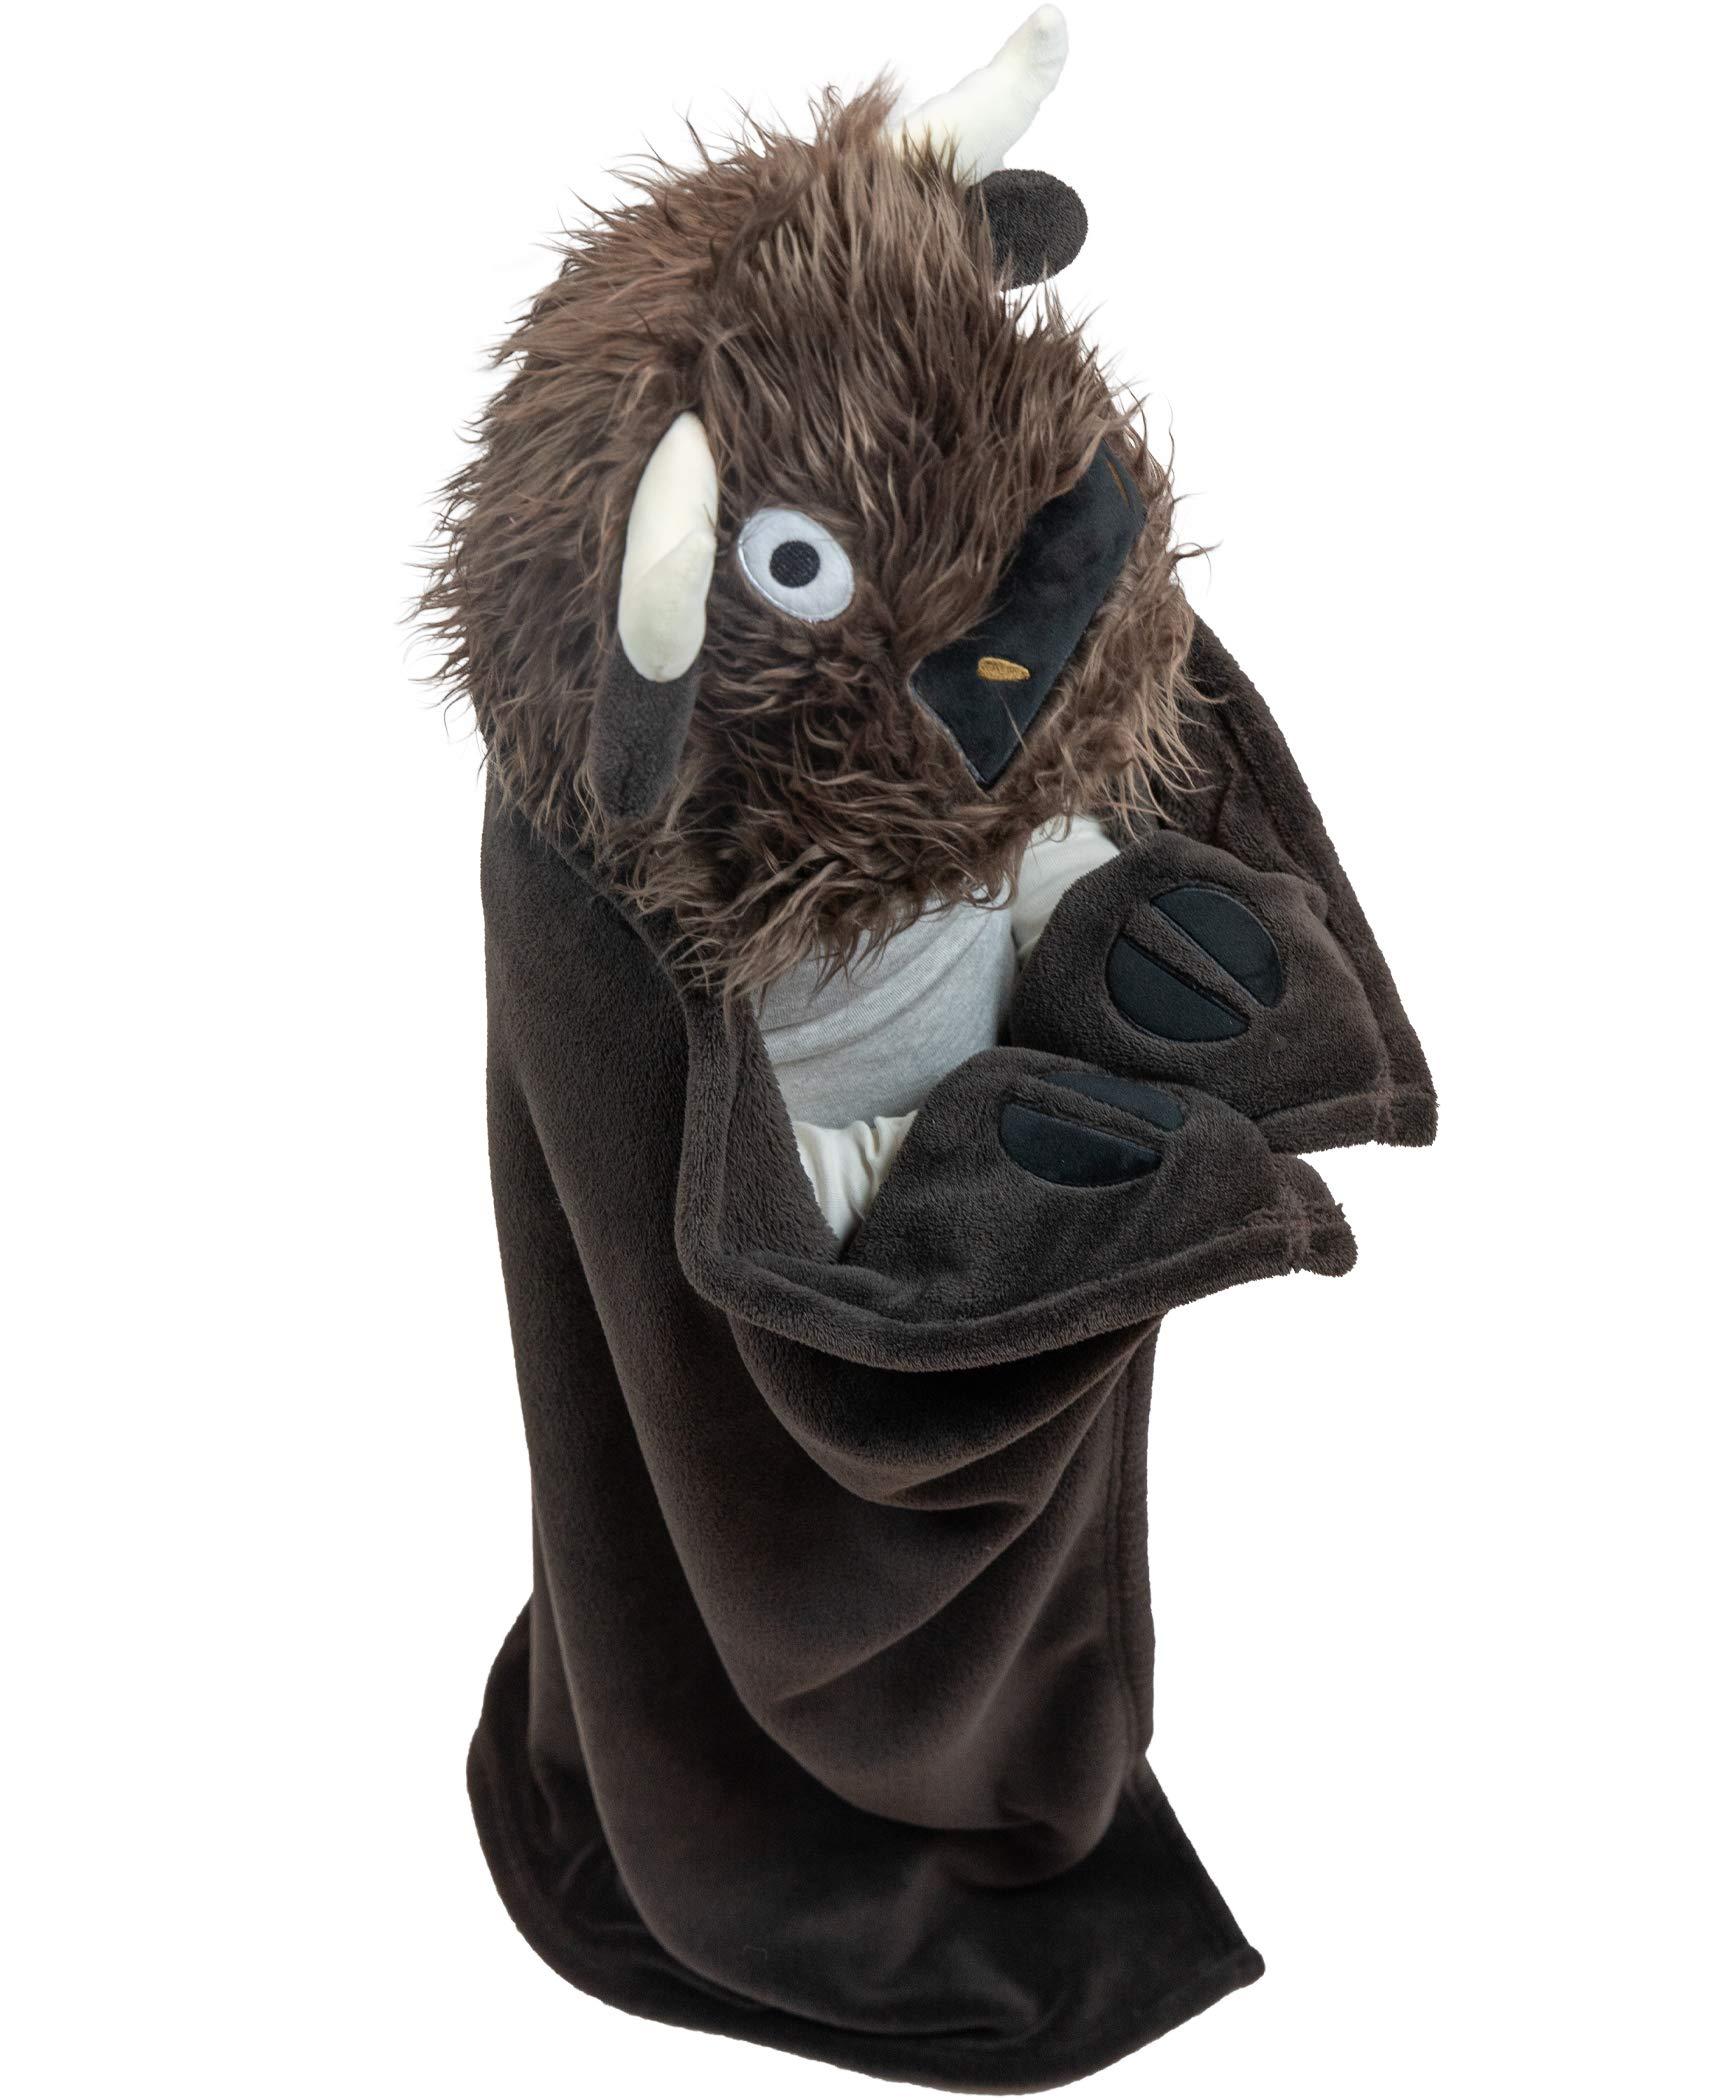 Lazy One Animal Blanket Hoodie for Kids, Hooded Blanket, Wearable Kids' Blanket, Soft, Cozy Fleece Hoodie (Buffalo Blanket)